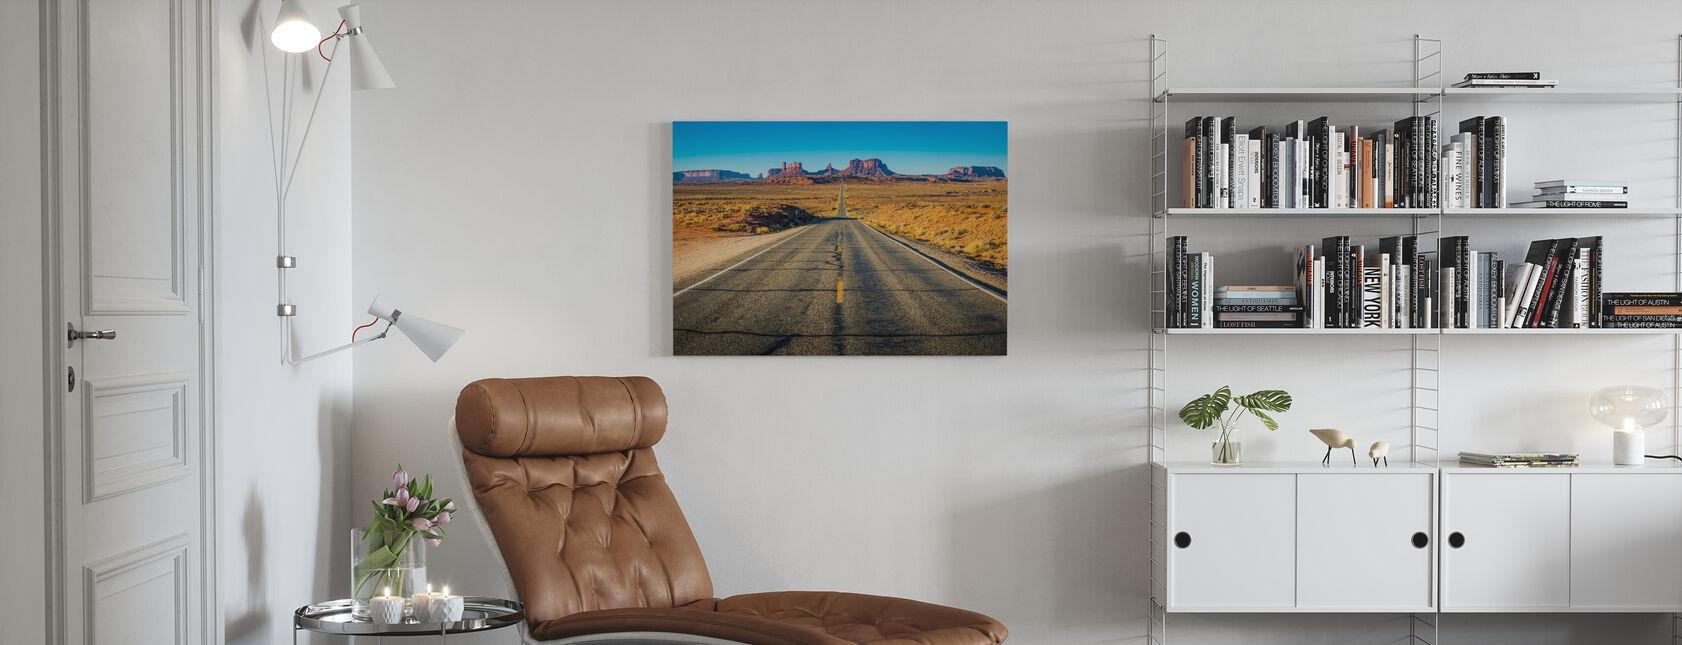 Monument Valley Road - Canvastavla - Vardagsrum